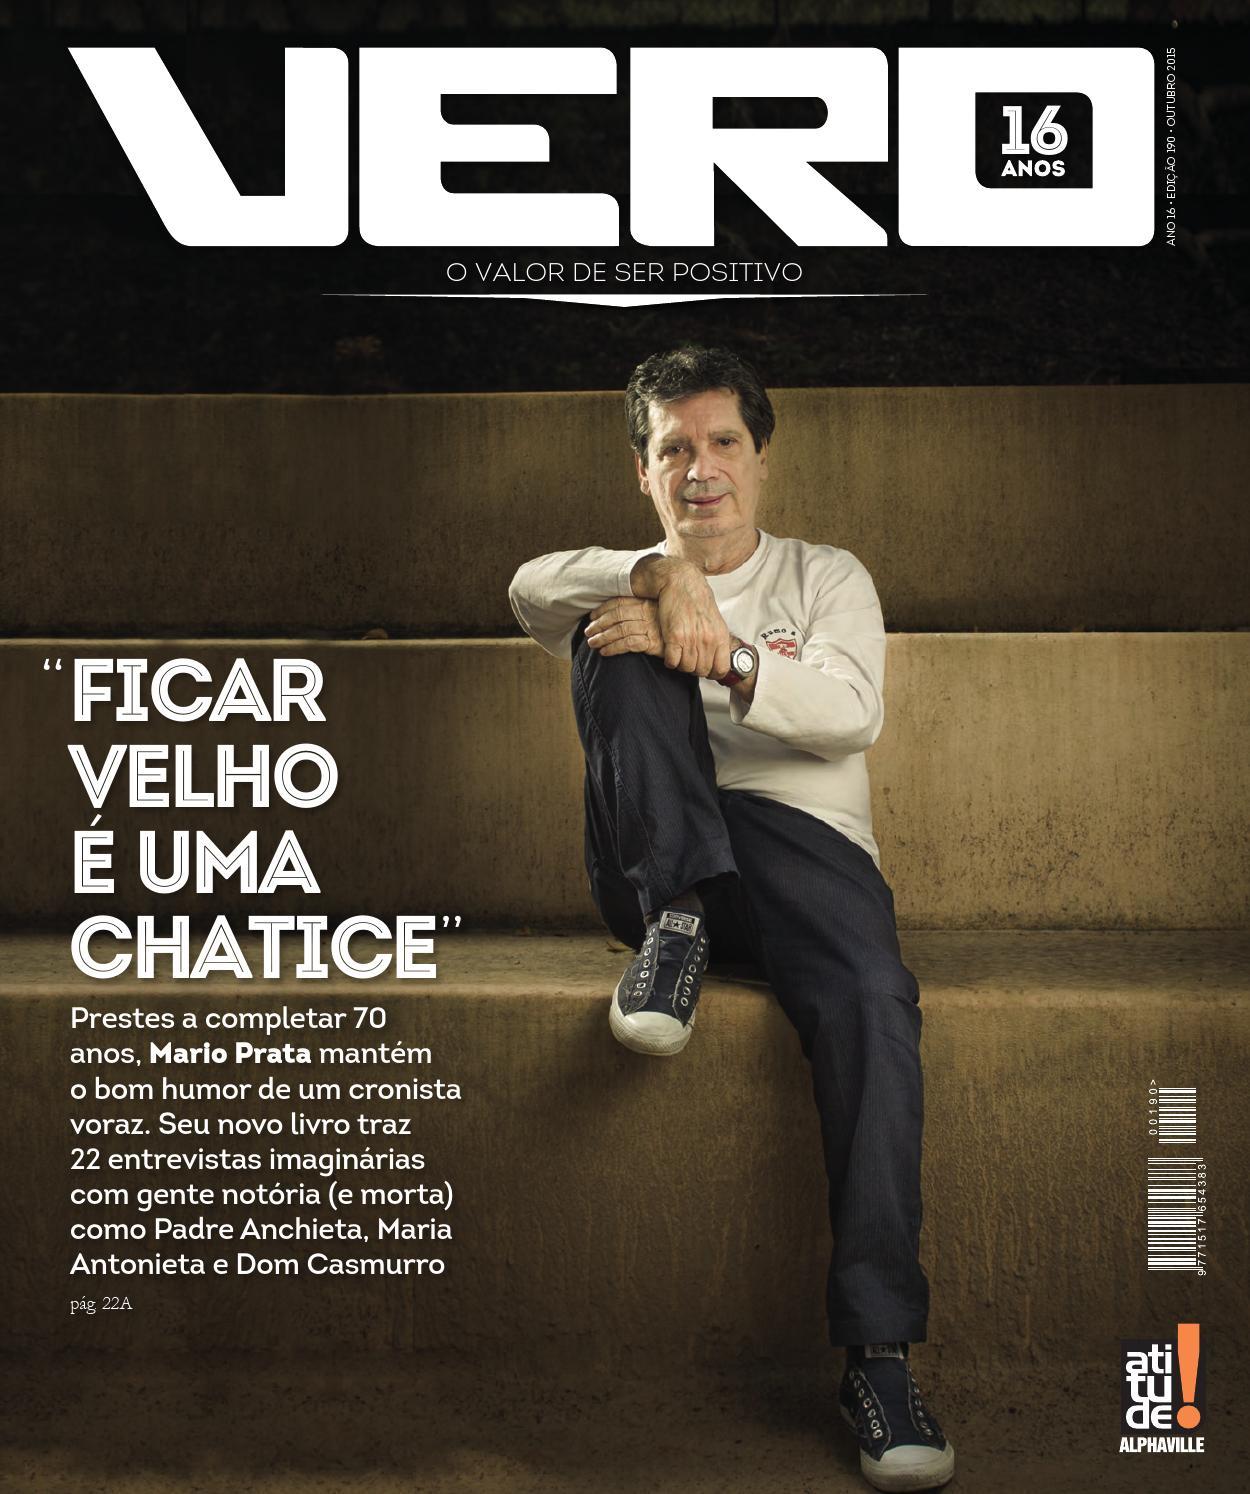 cf5a0d6a2e56e4 Revista VERO | Out/2015 by Vero Alphaville - issuu